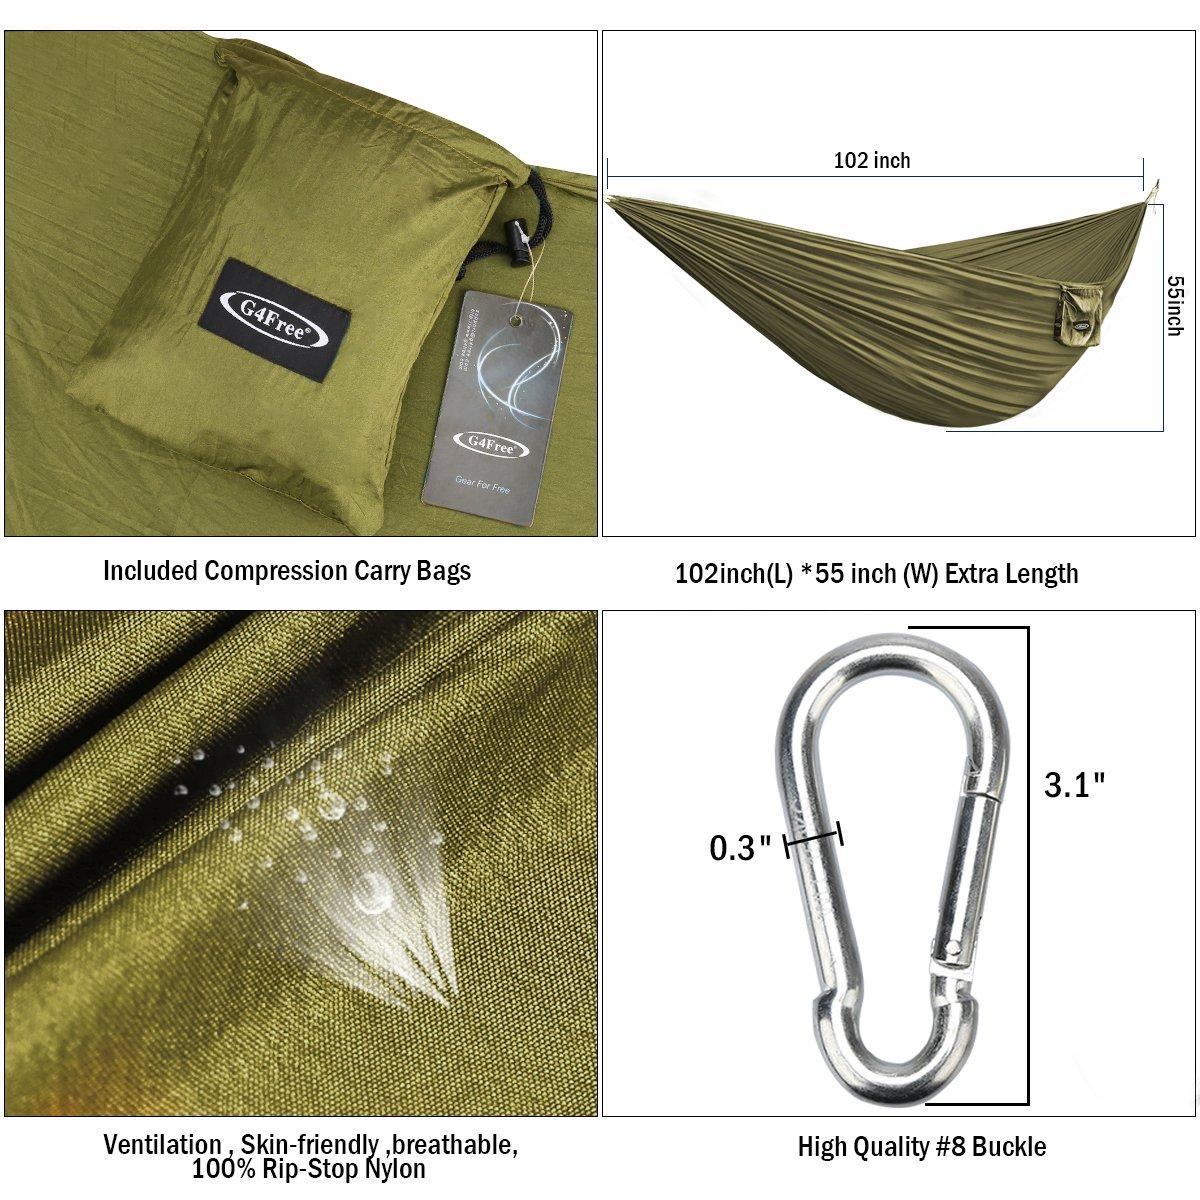 Navy Blue G4Free Portable Hammock Lightweight Nylon Fabric Parachute Hammock for Outdoor Camping Hiking,Travel Hammock Ropes /& Steel Carabiners Included Hammock Ropes /& Steel Carabiners Included G4Garden